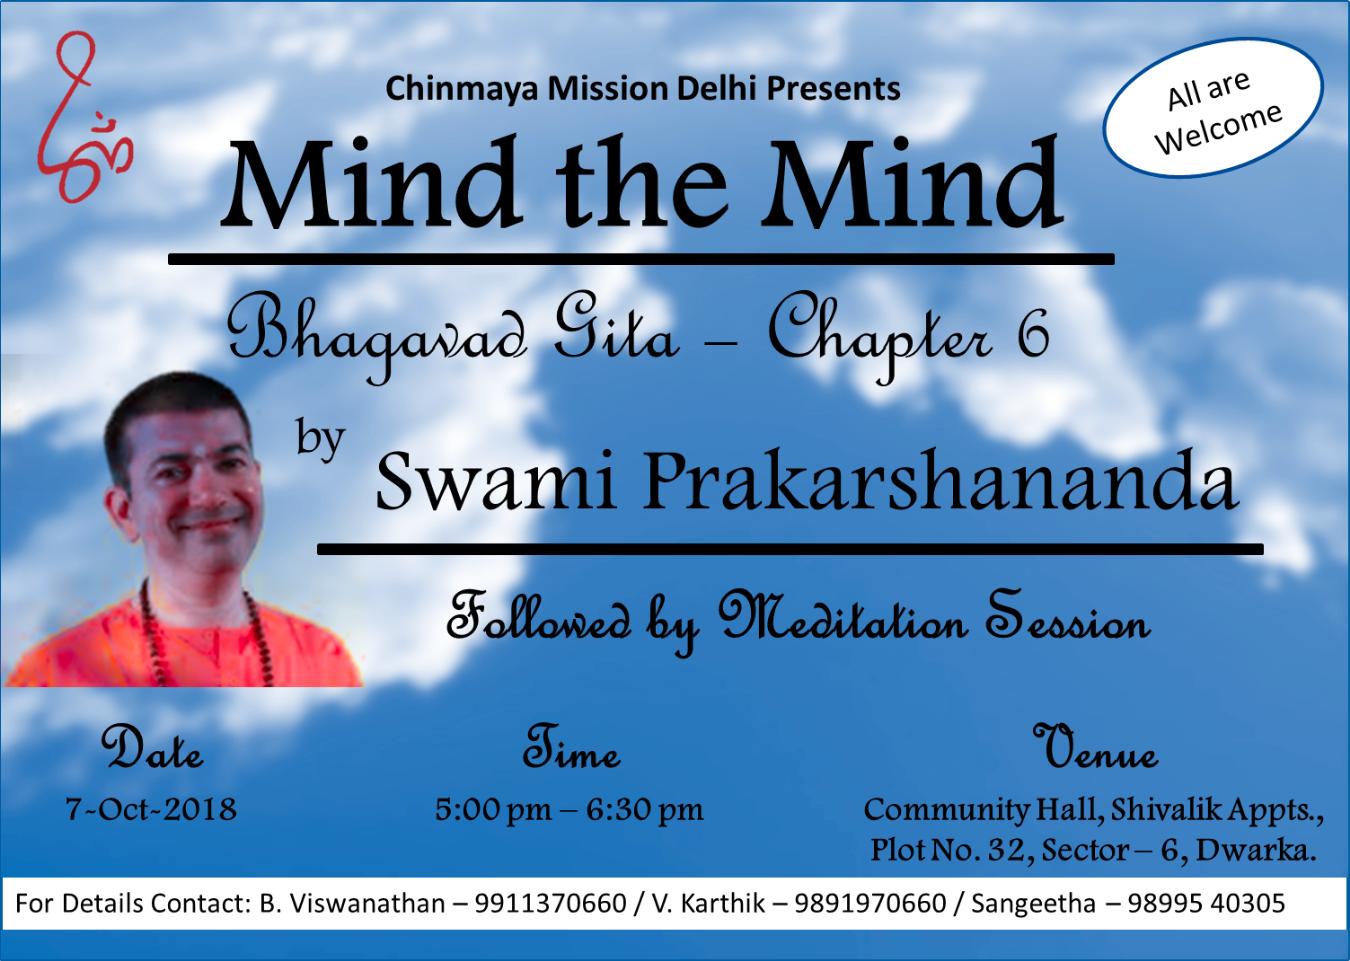 Mind the Mind - Bhagavad Gita Chapter 6 Tickets by V Karthik